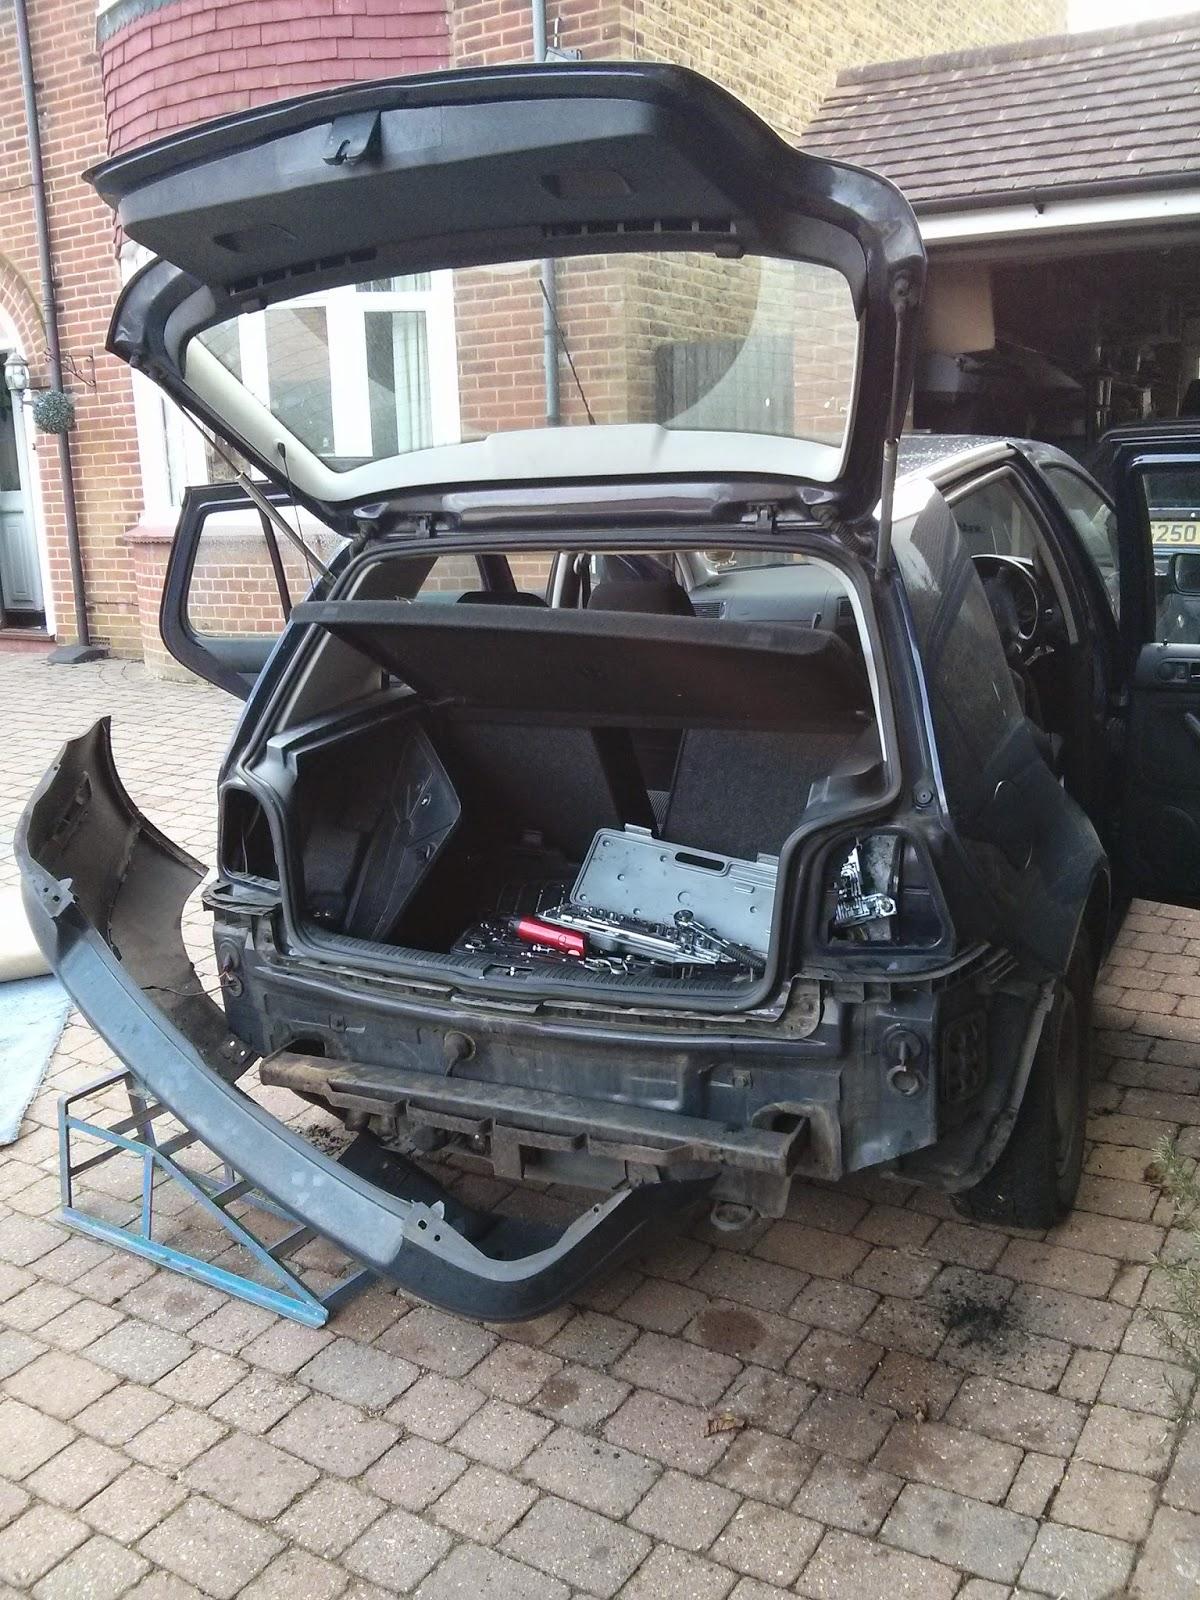 VW Golf MK4 rear bumper removal